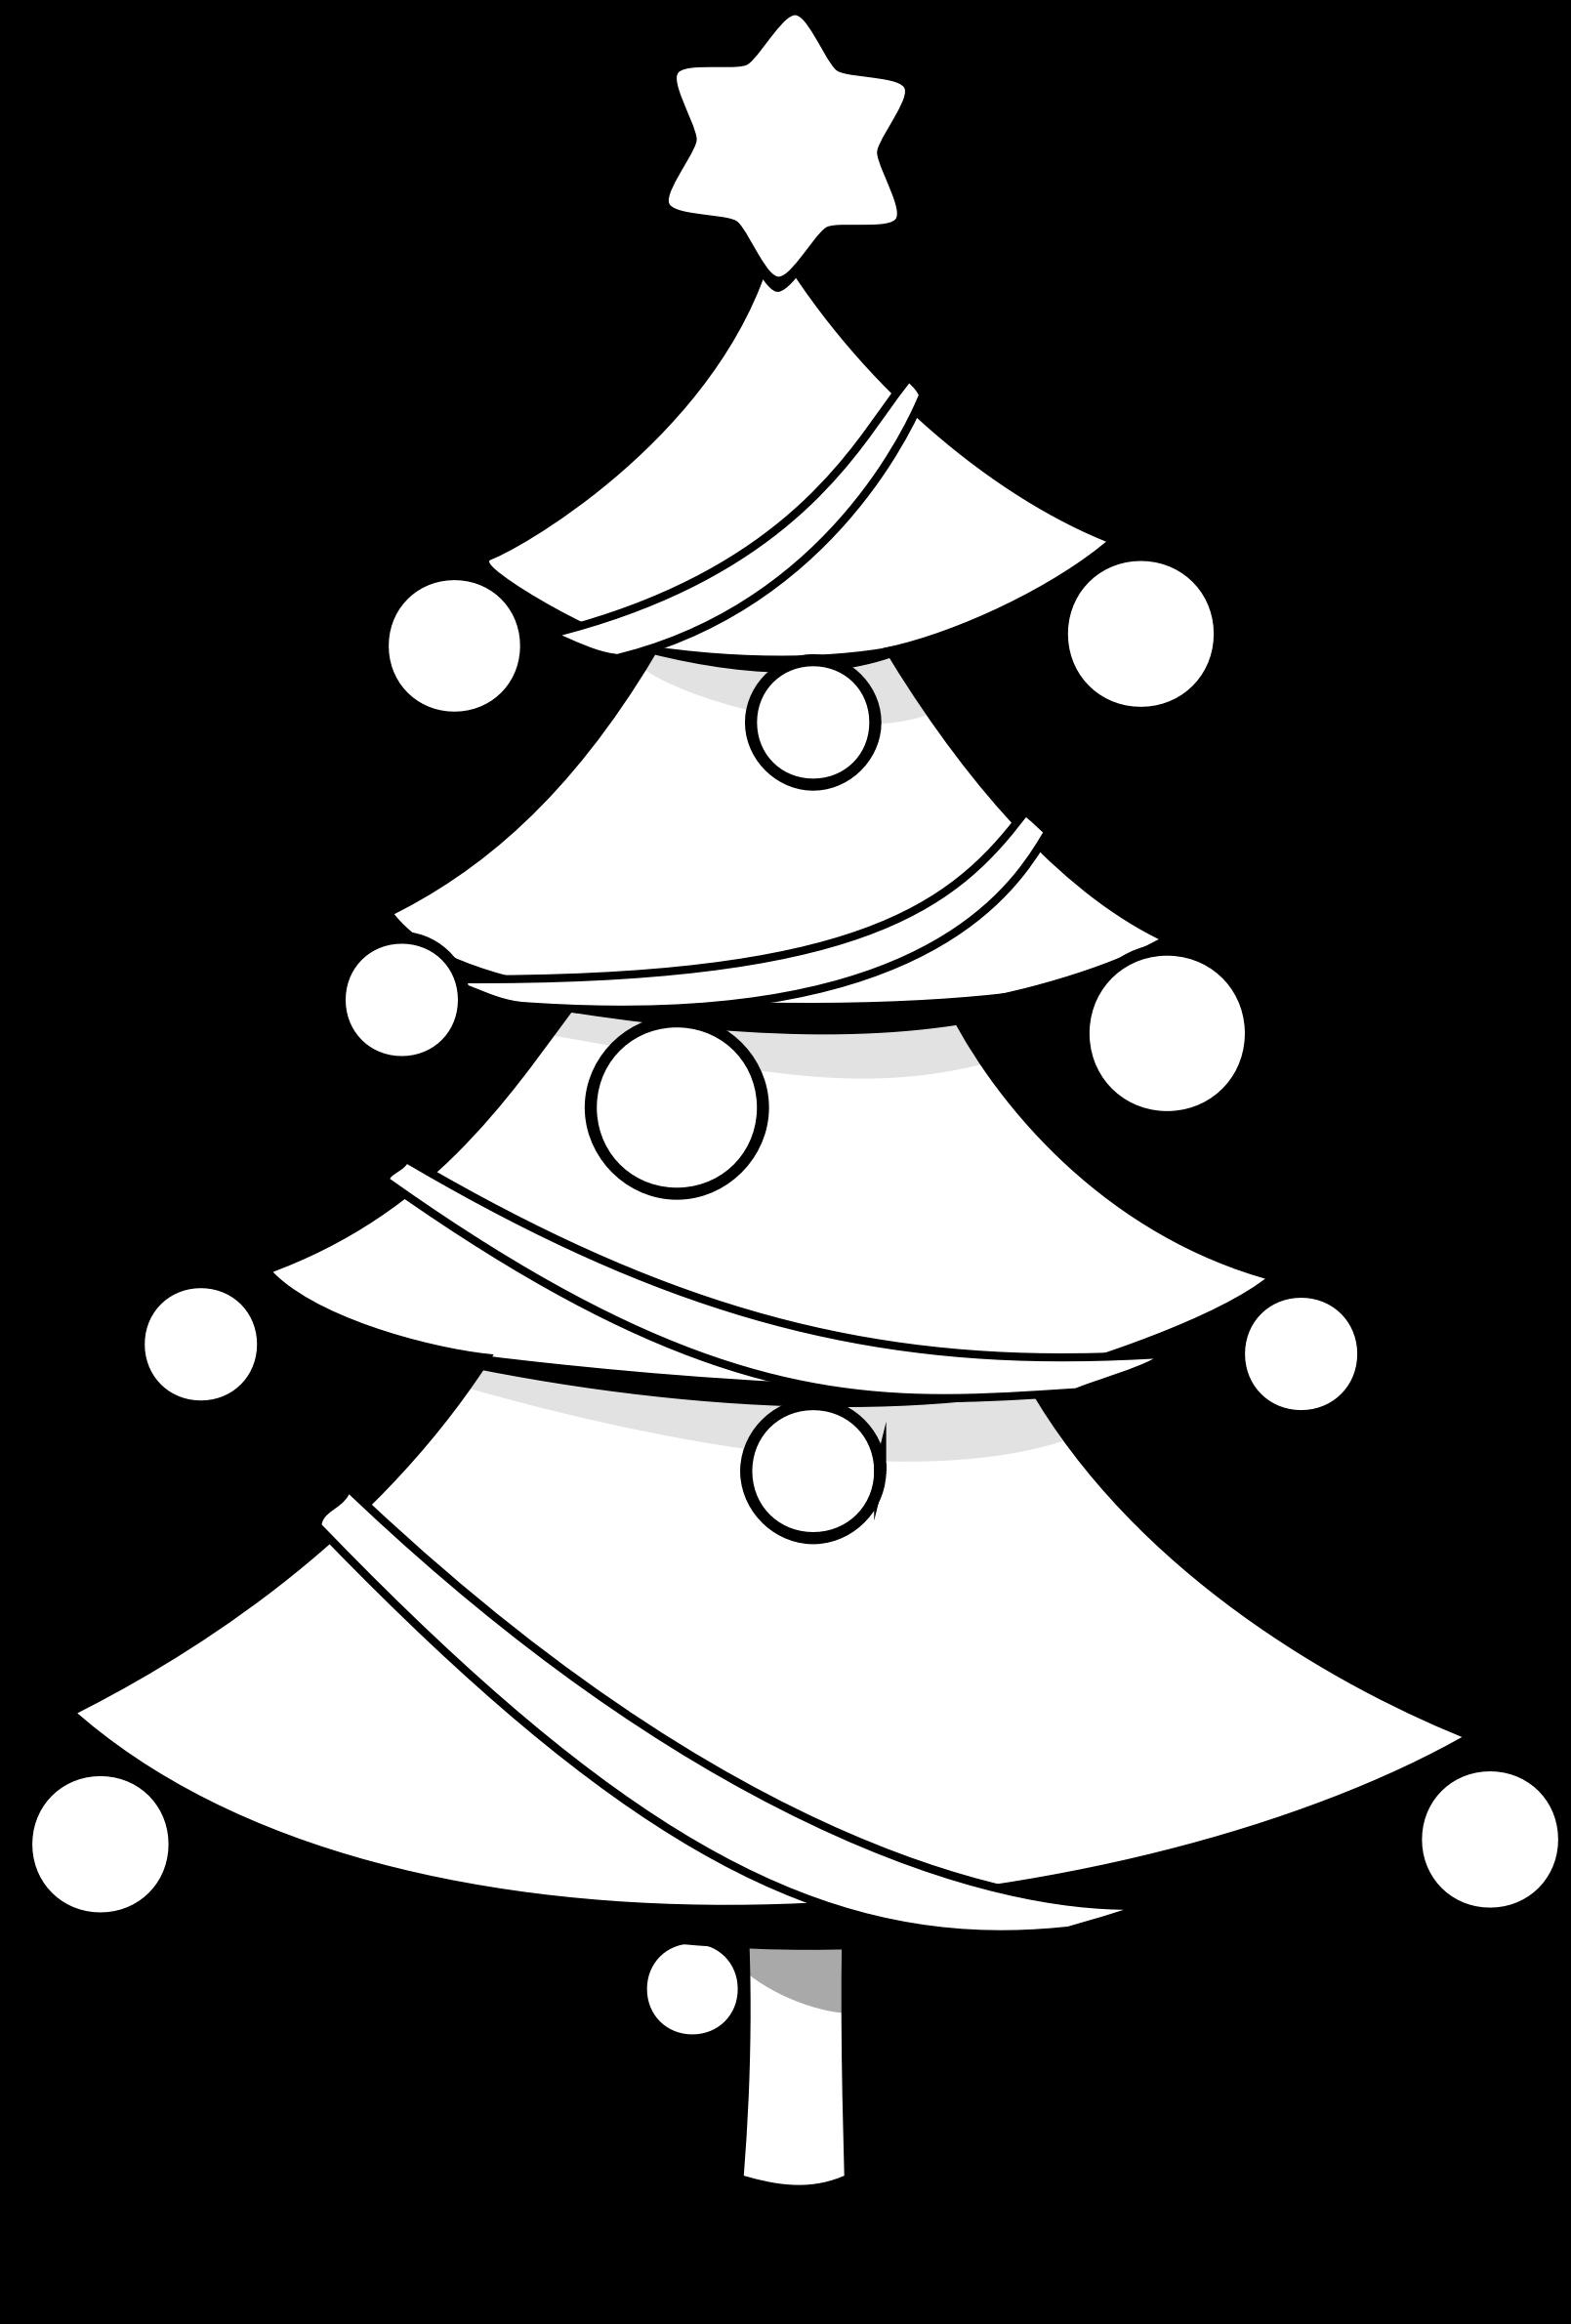 1609x2380 Christmas Tree Clip Art Black And White Fun For Christmas